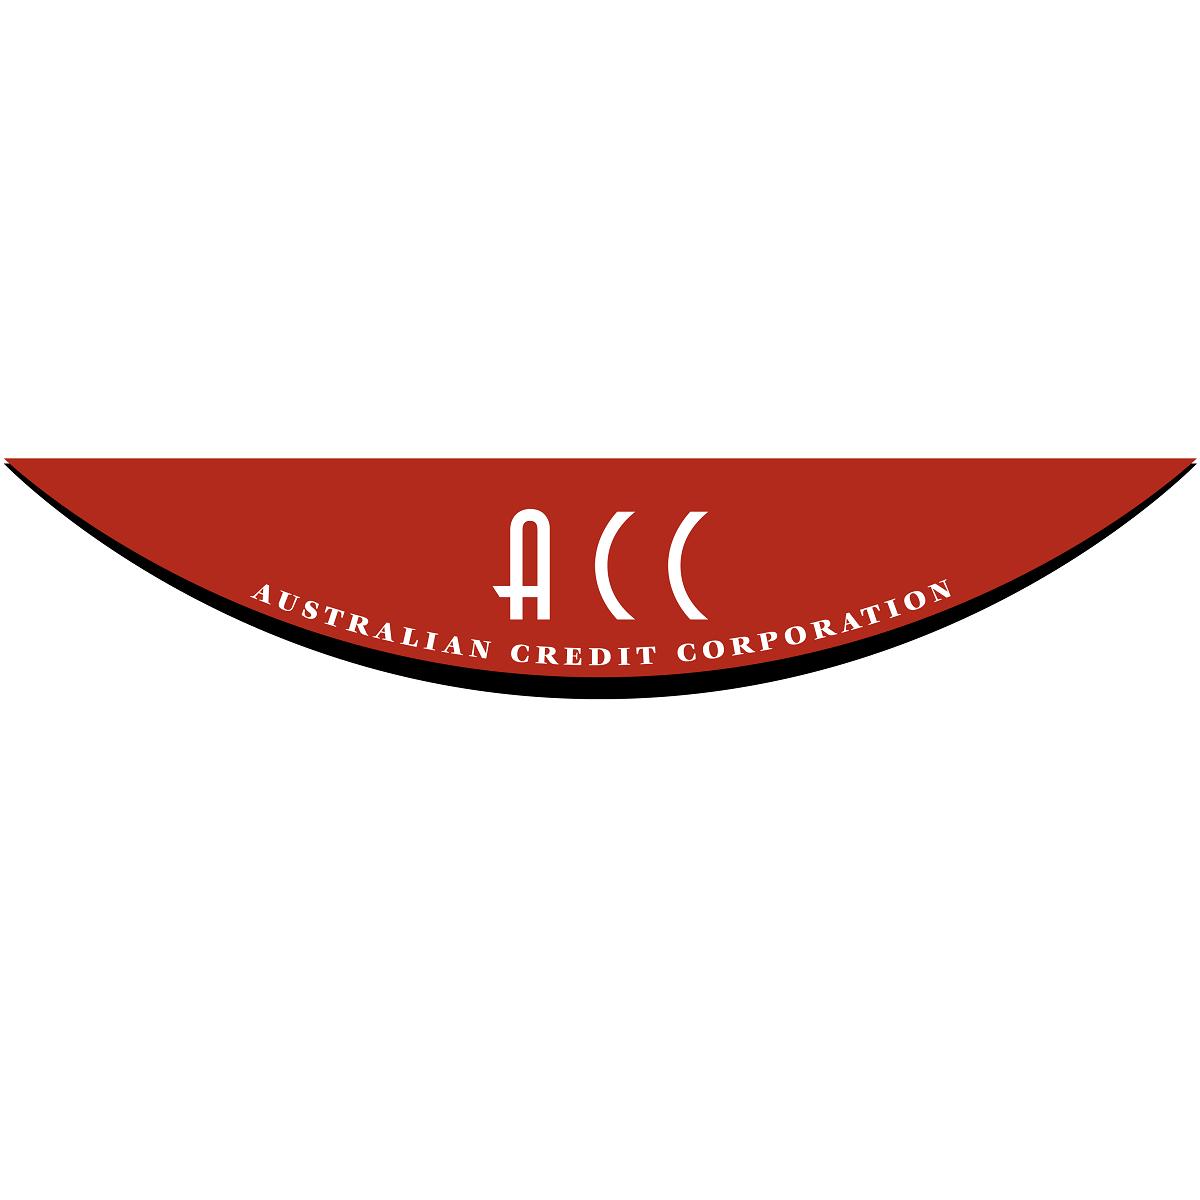 acc_logo_large.png